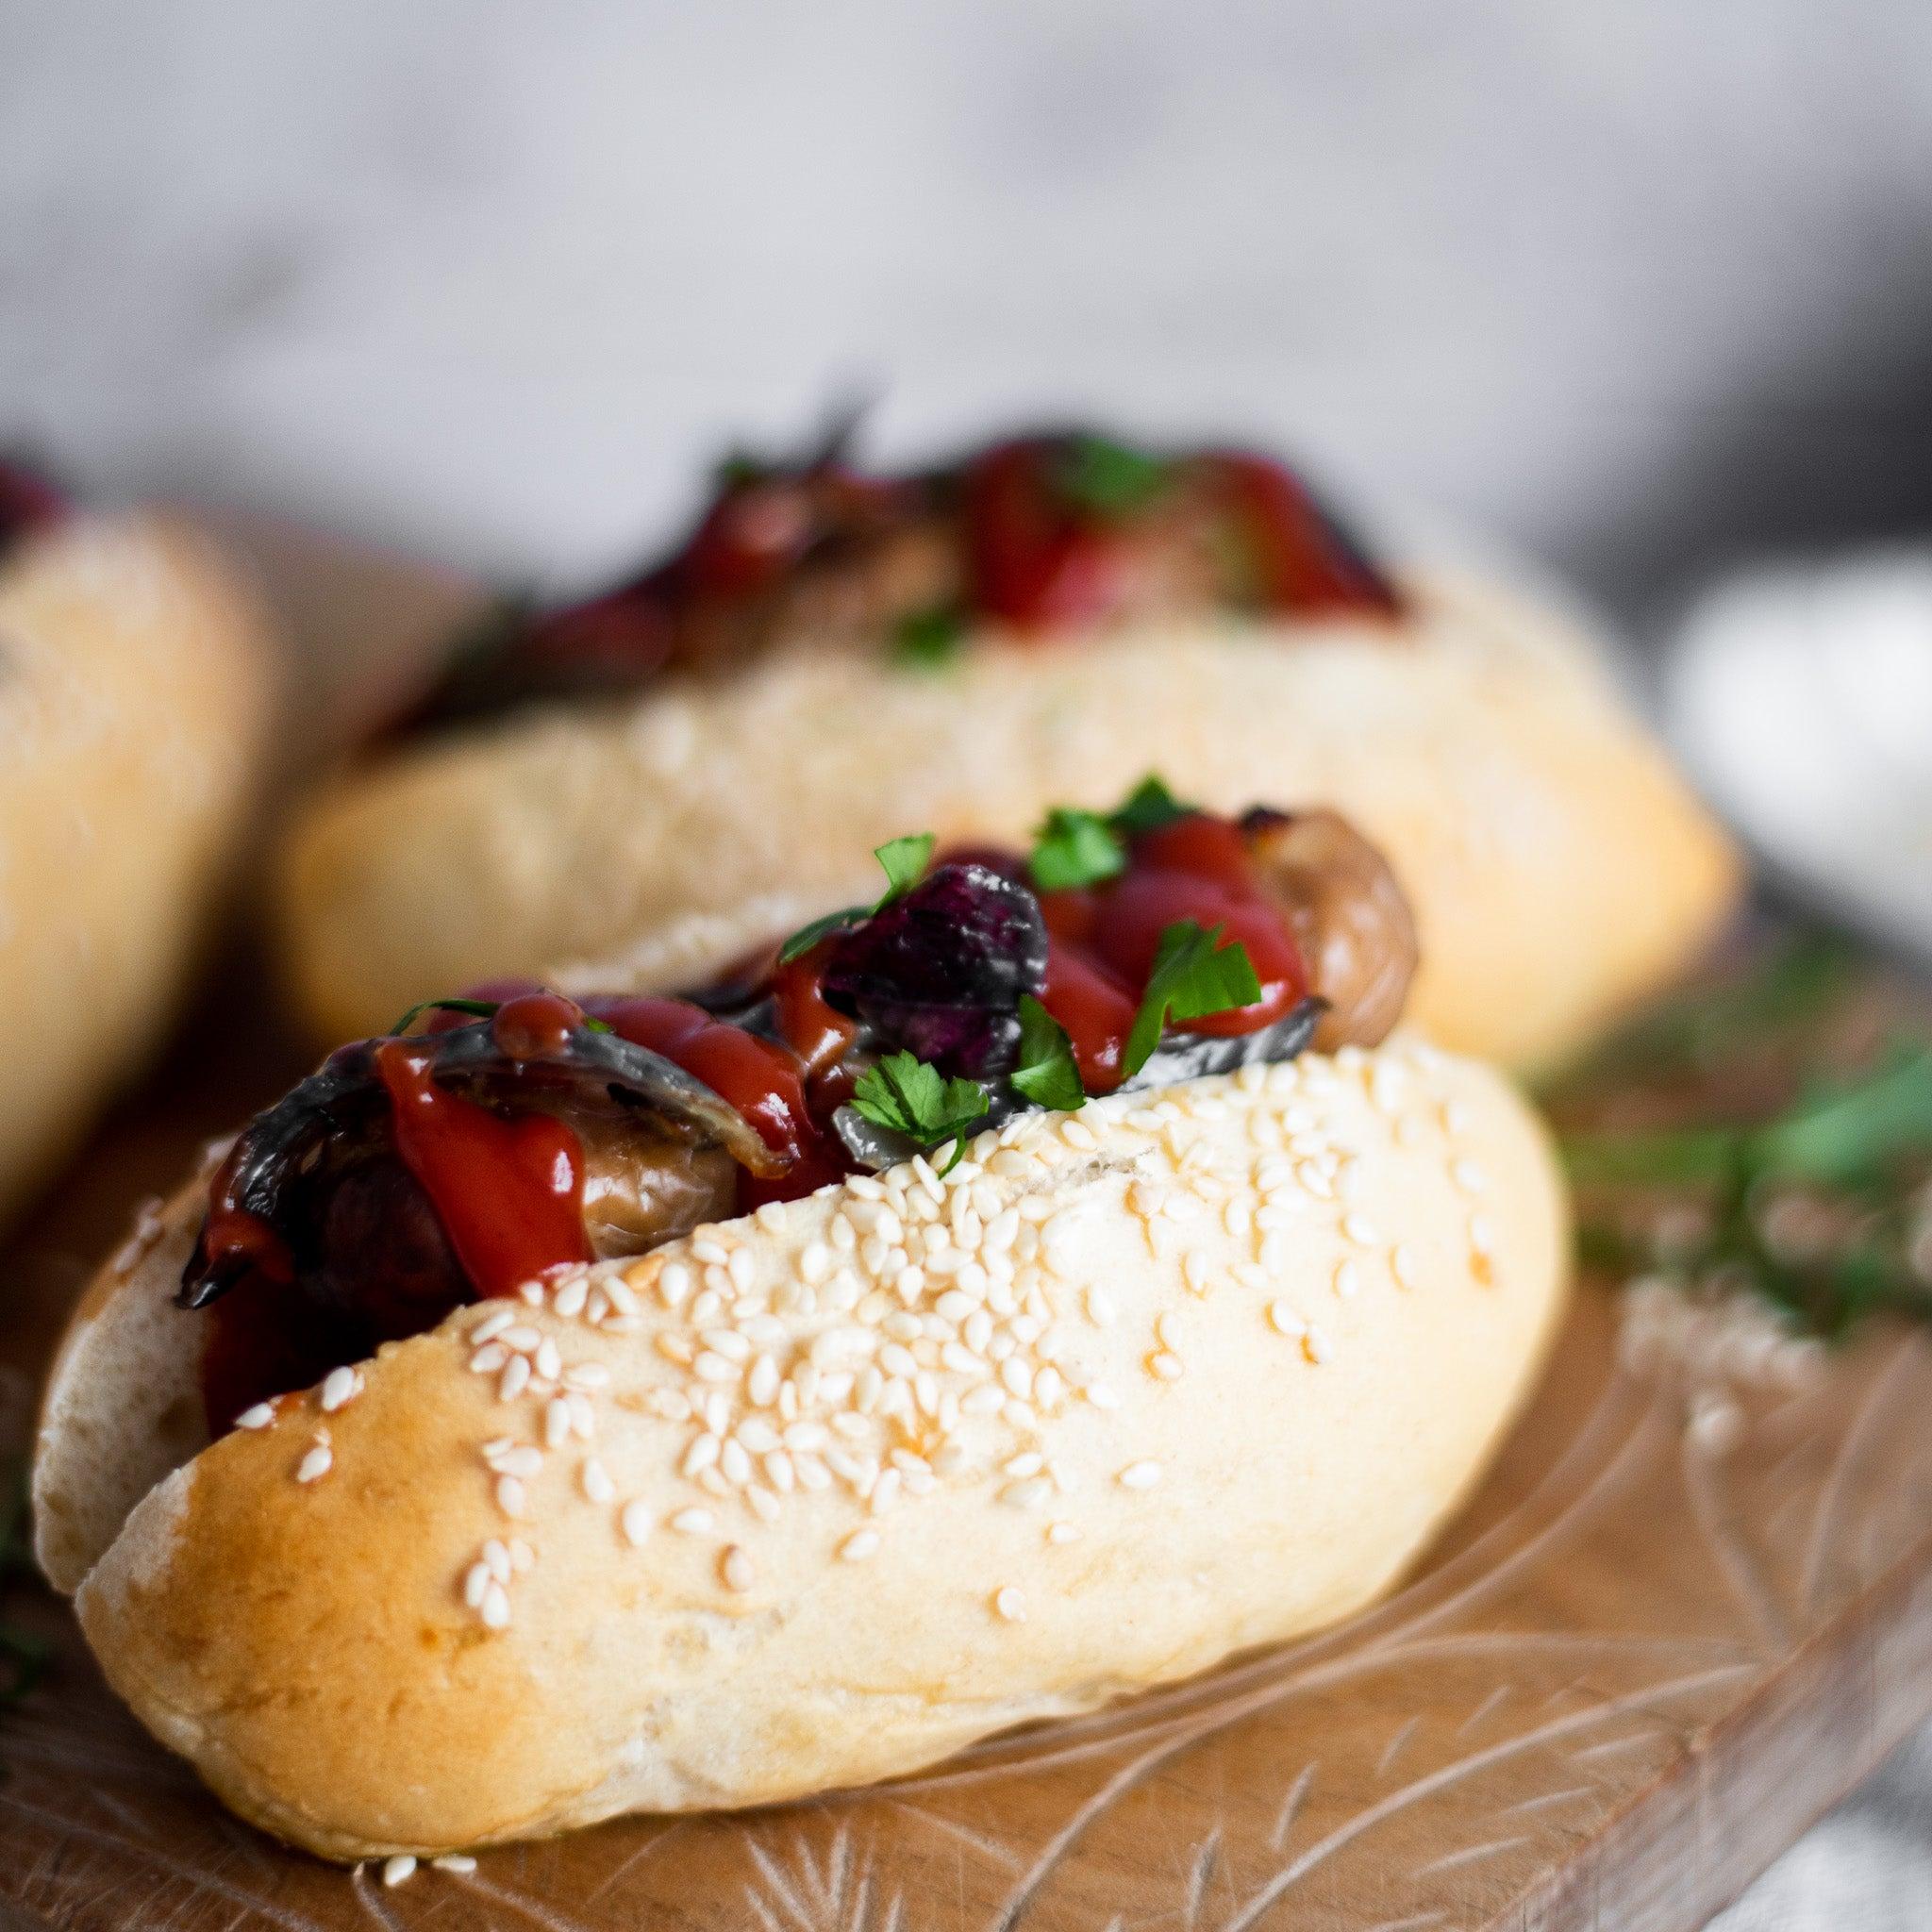 Allinsons-Hot-Dog-Rolls-1-1-Baking-Mad-5.jpg